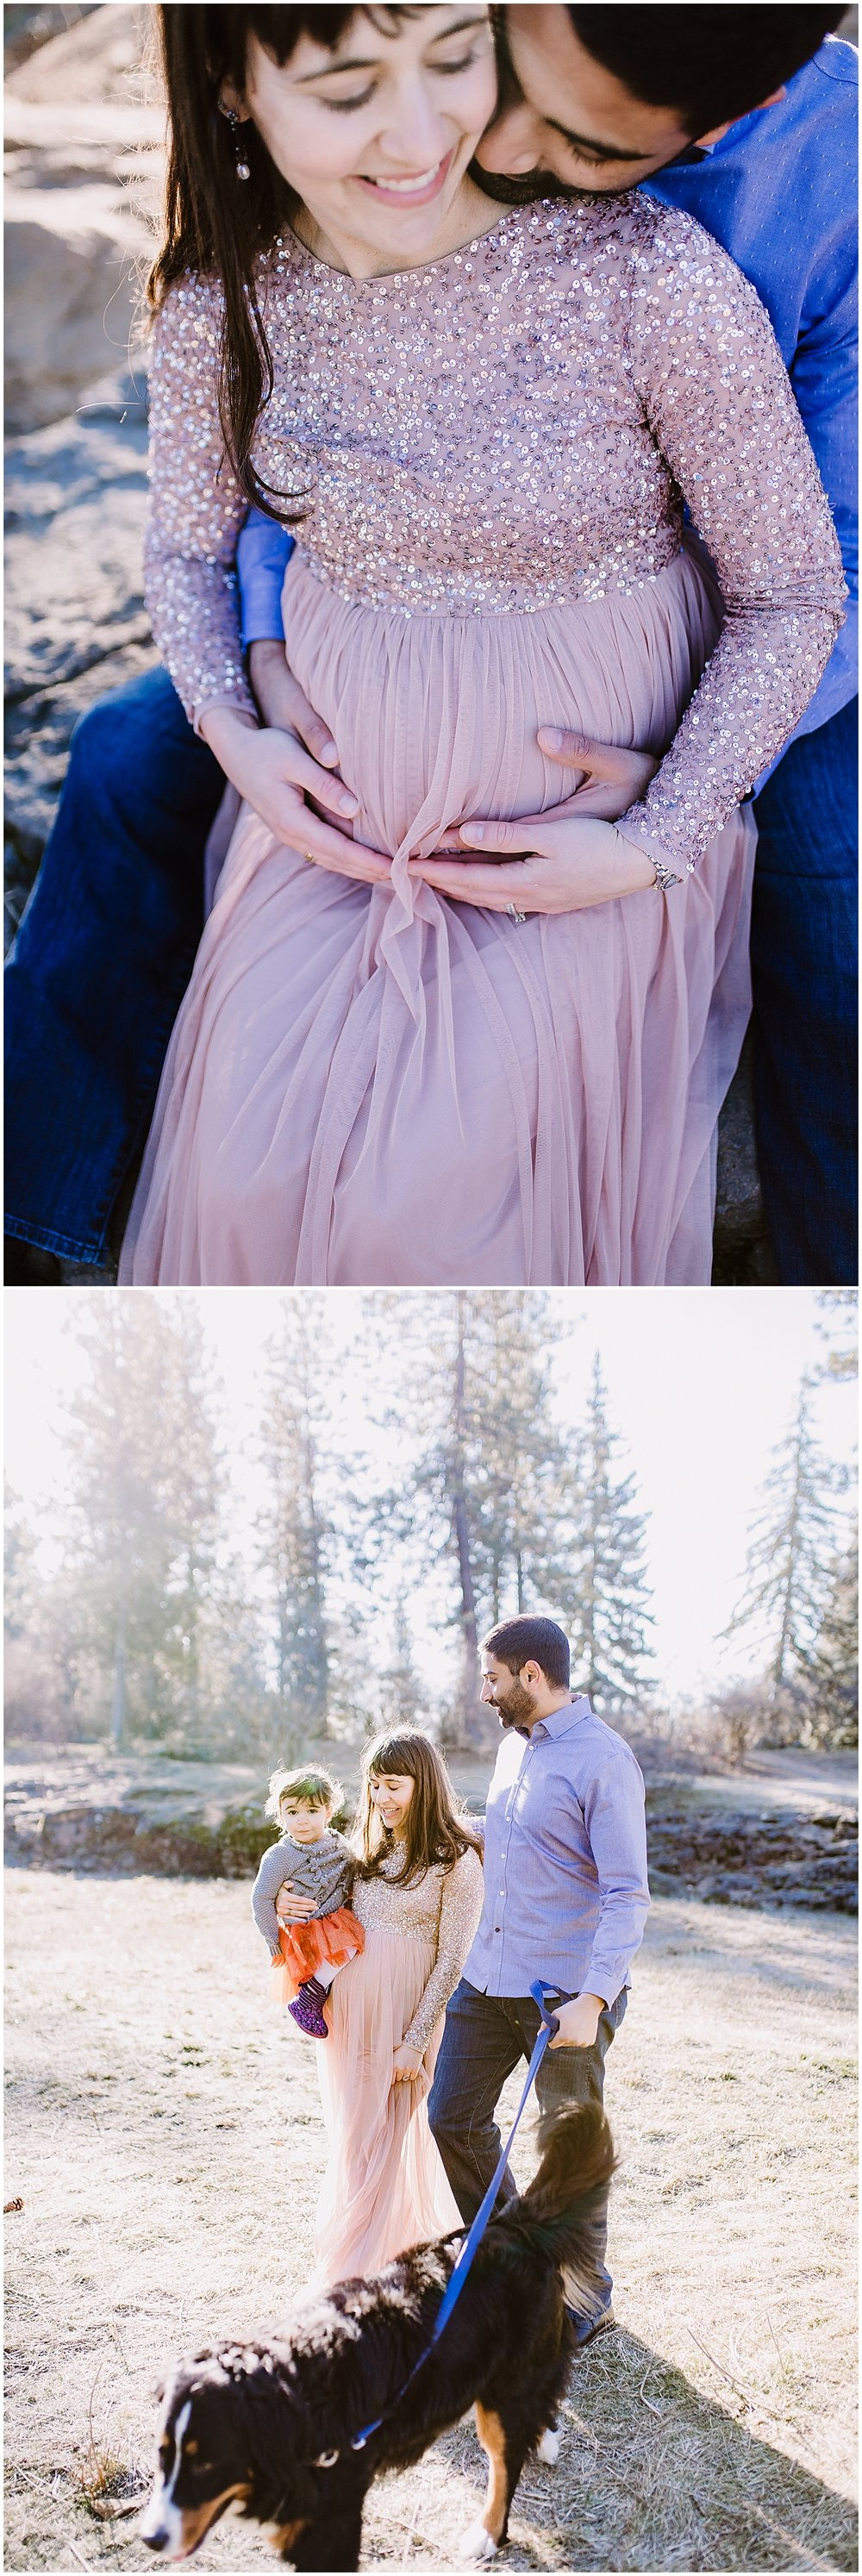 Spokane Maternity Photos.jpg